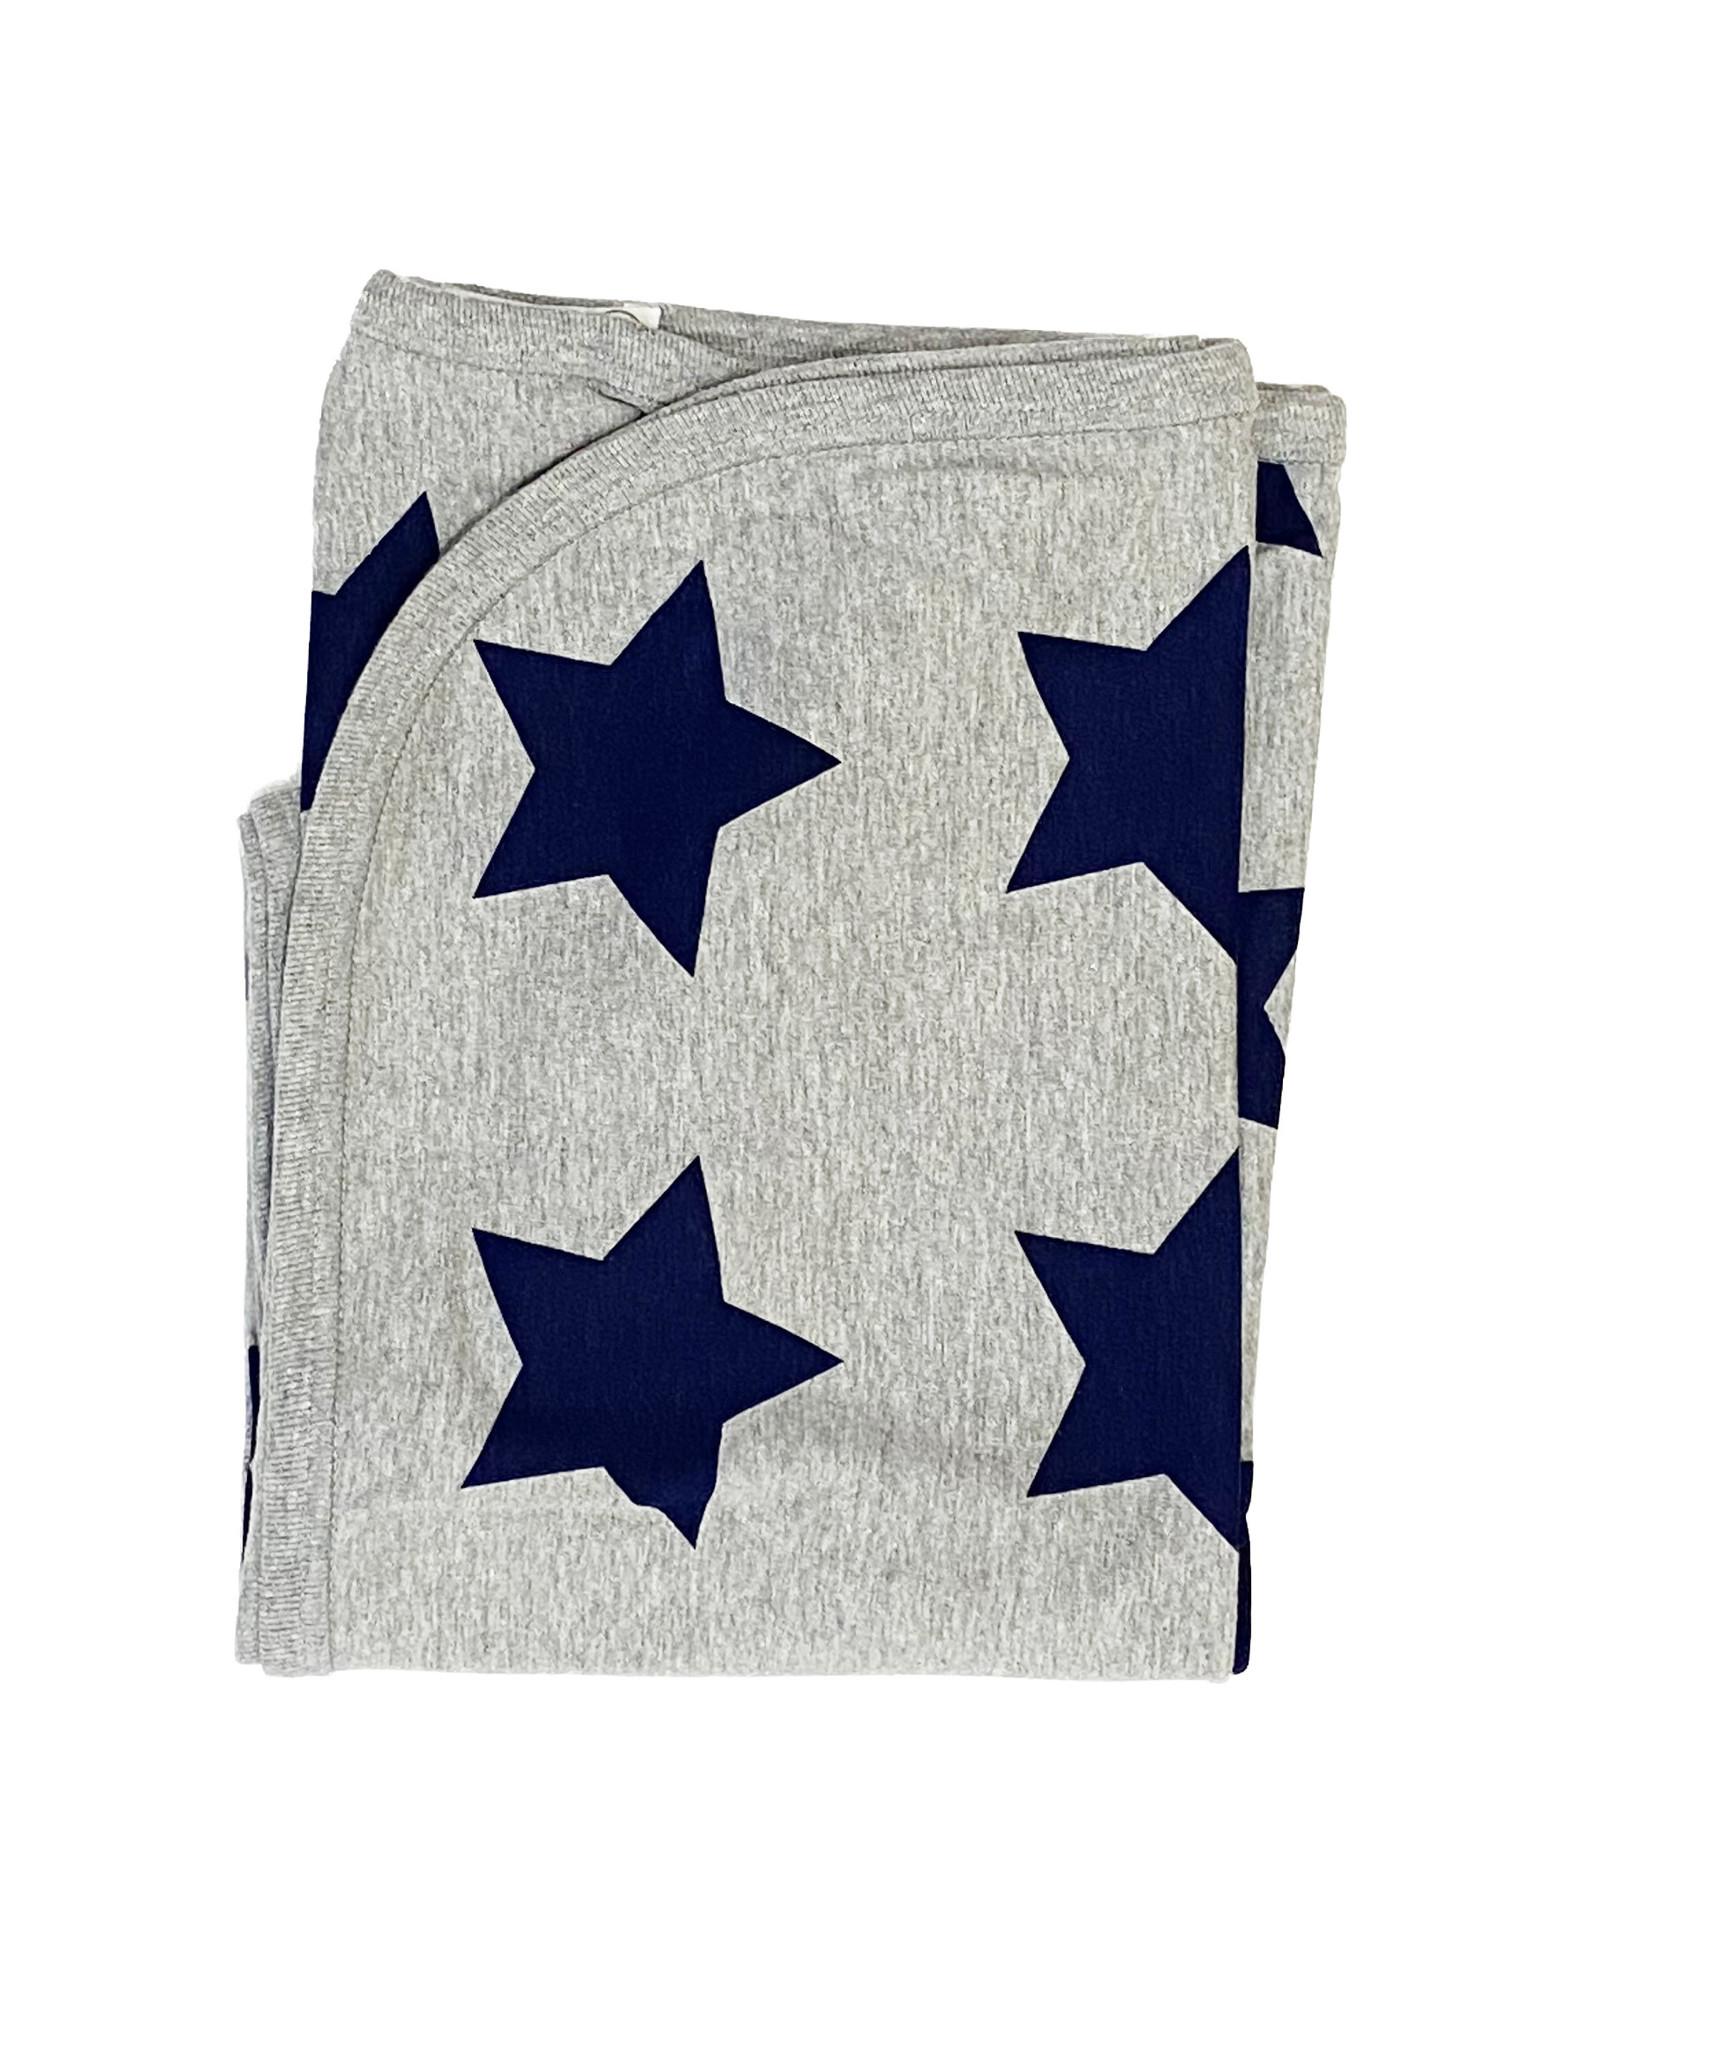 Little Mish Grey/Navy Lg Stars Blanket